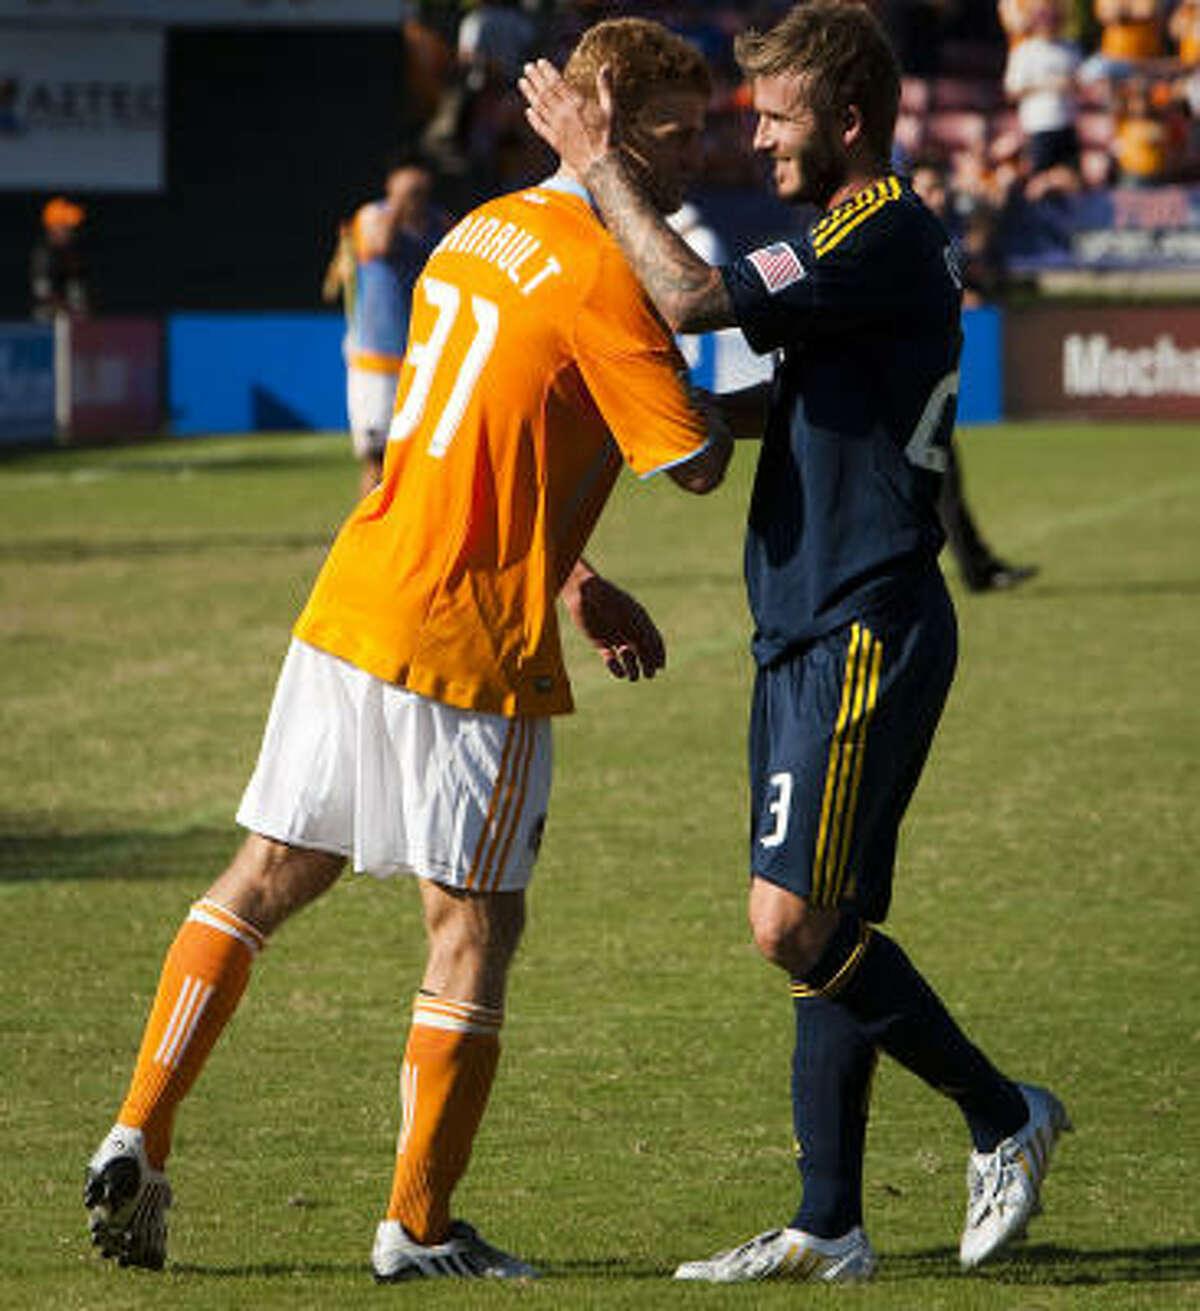 David Beckham of the Los Angeles Galaxy hugs Dynamo defenseman Andrew Hainault following a scoreless draw against the Houston Dynamo at Robertson Stadium.